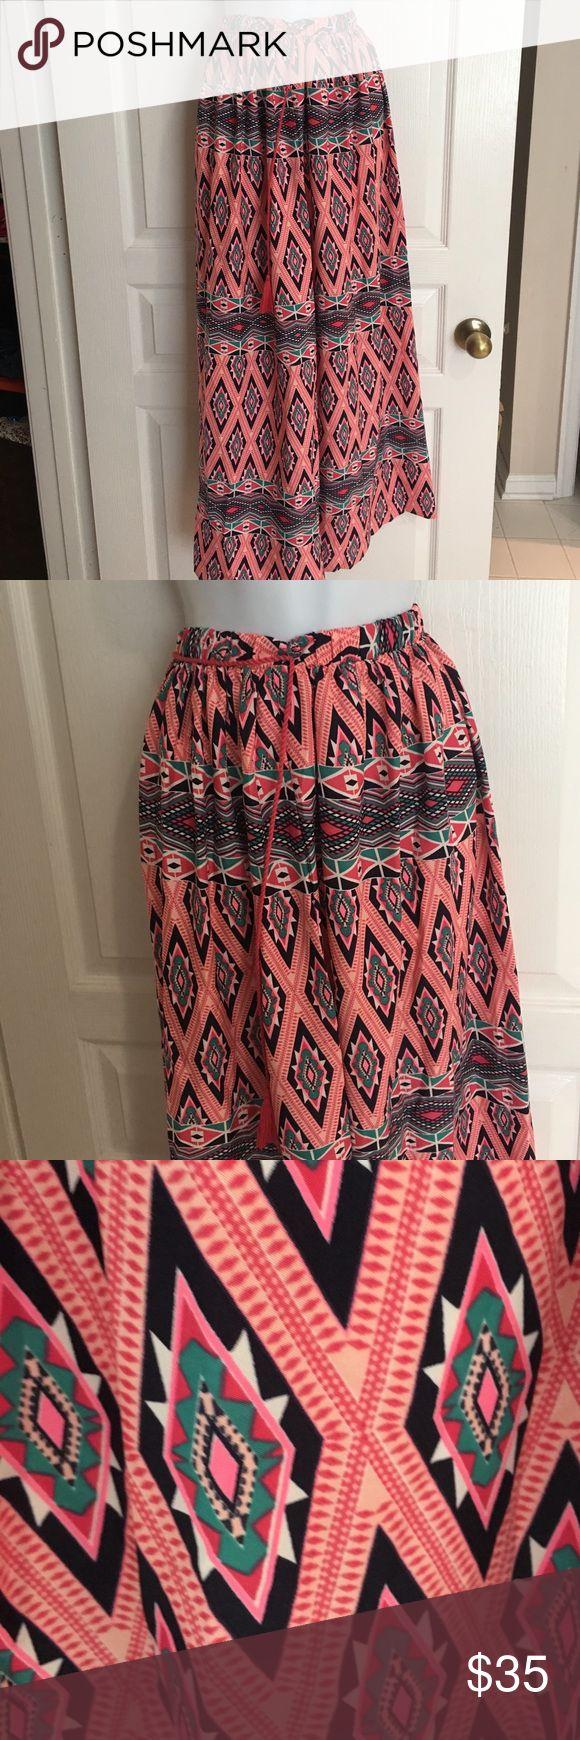 Plus Aztec Maxi Skirt 2X 40 inches long.  Elastic waist. Can fit a 1X, 2X and 3X True Destiny Skirts Maxi